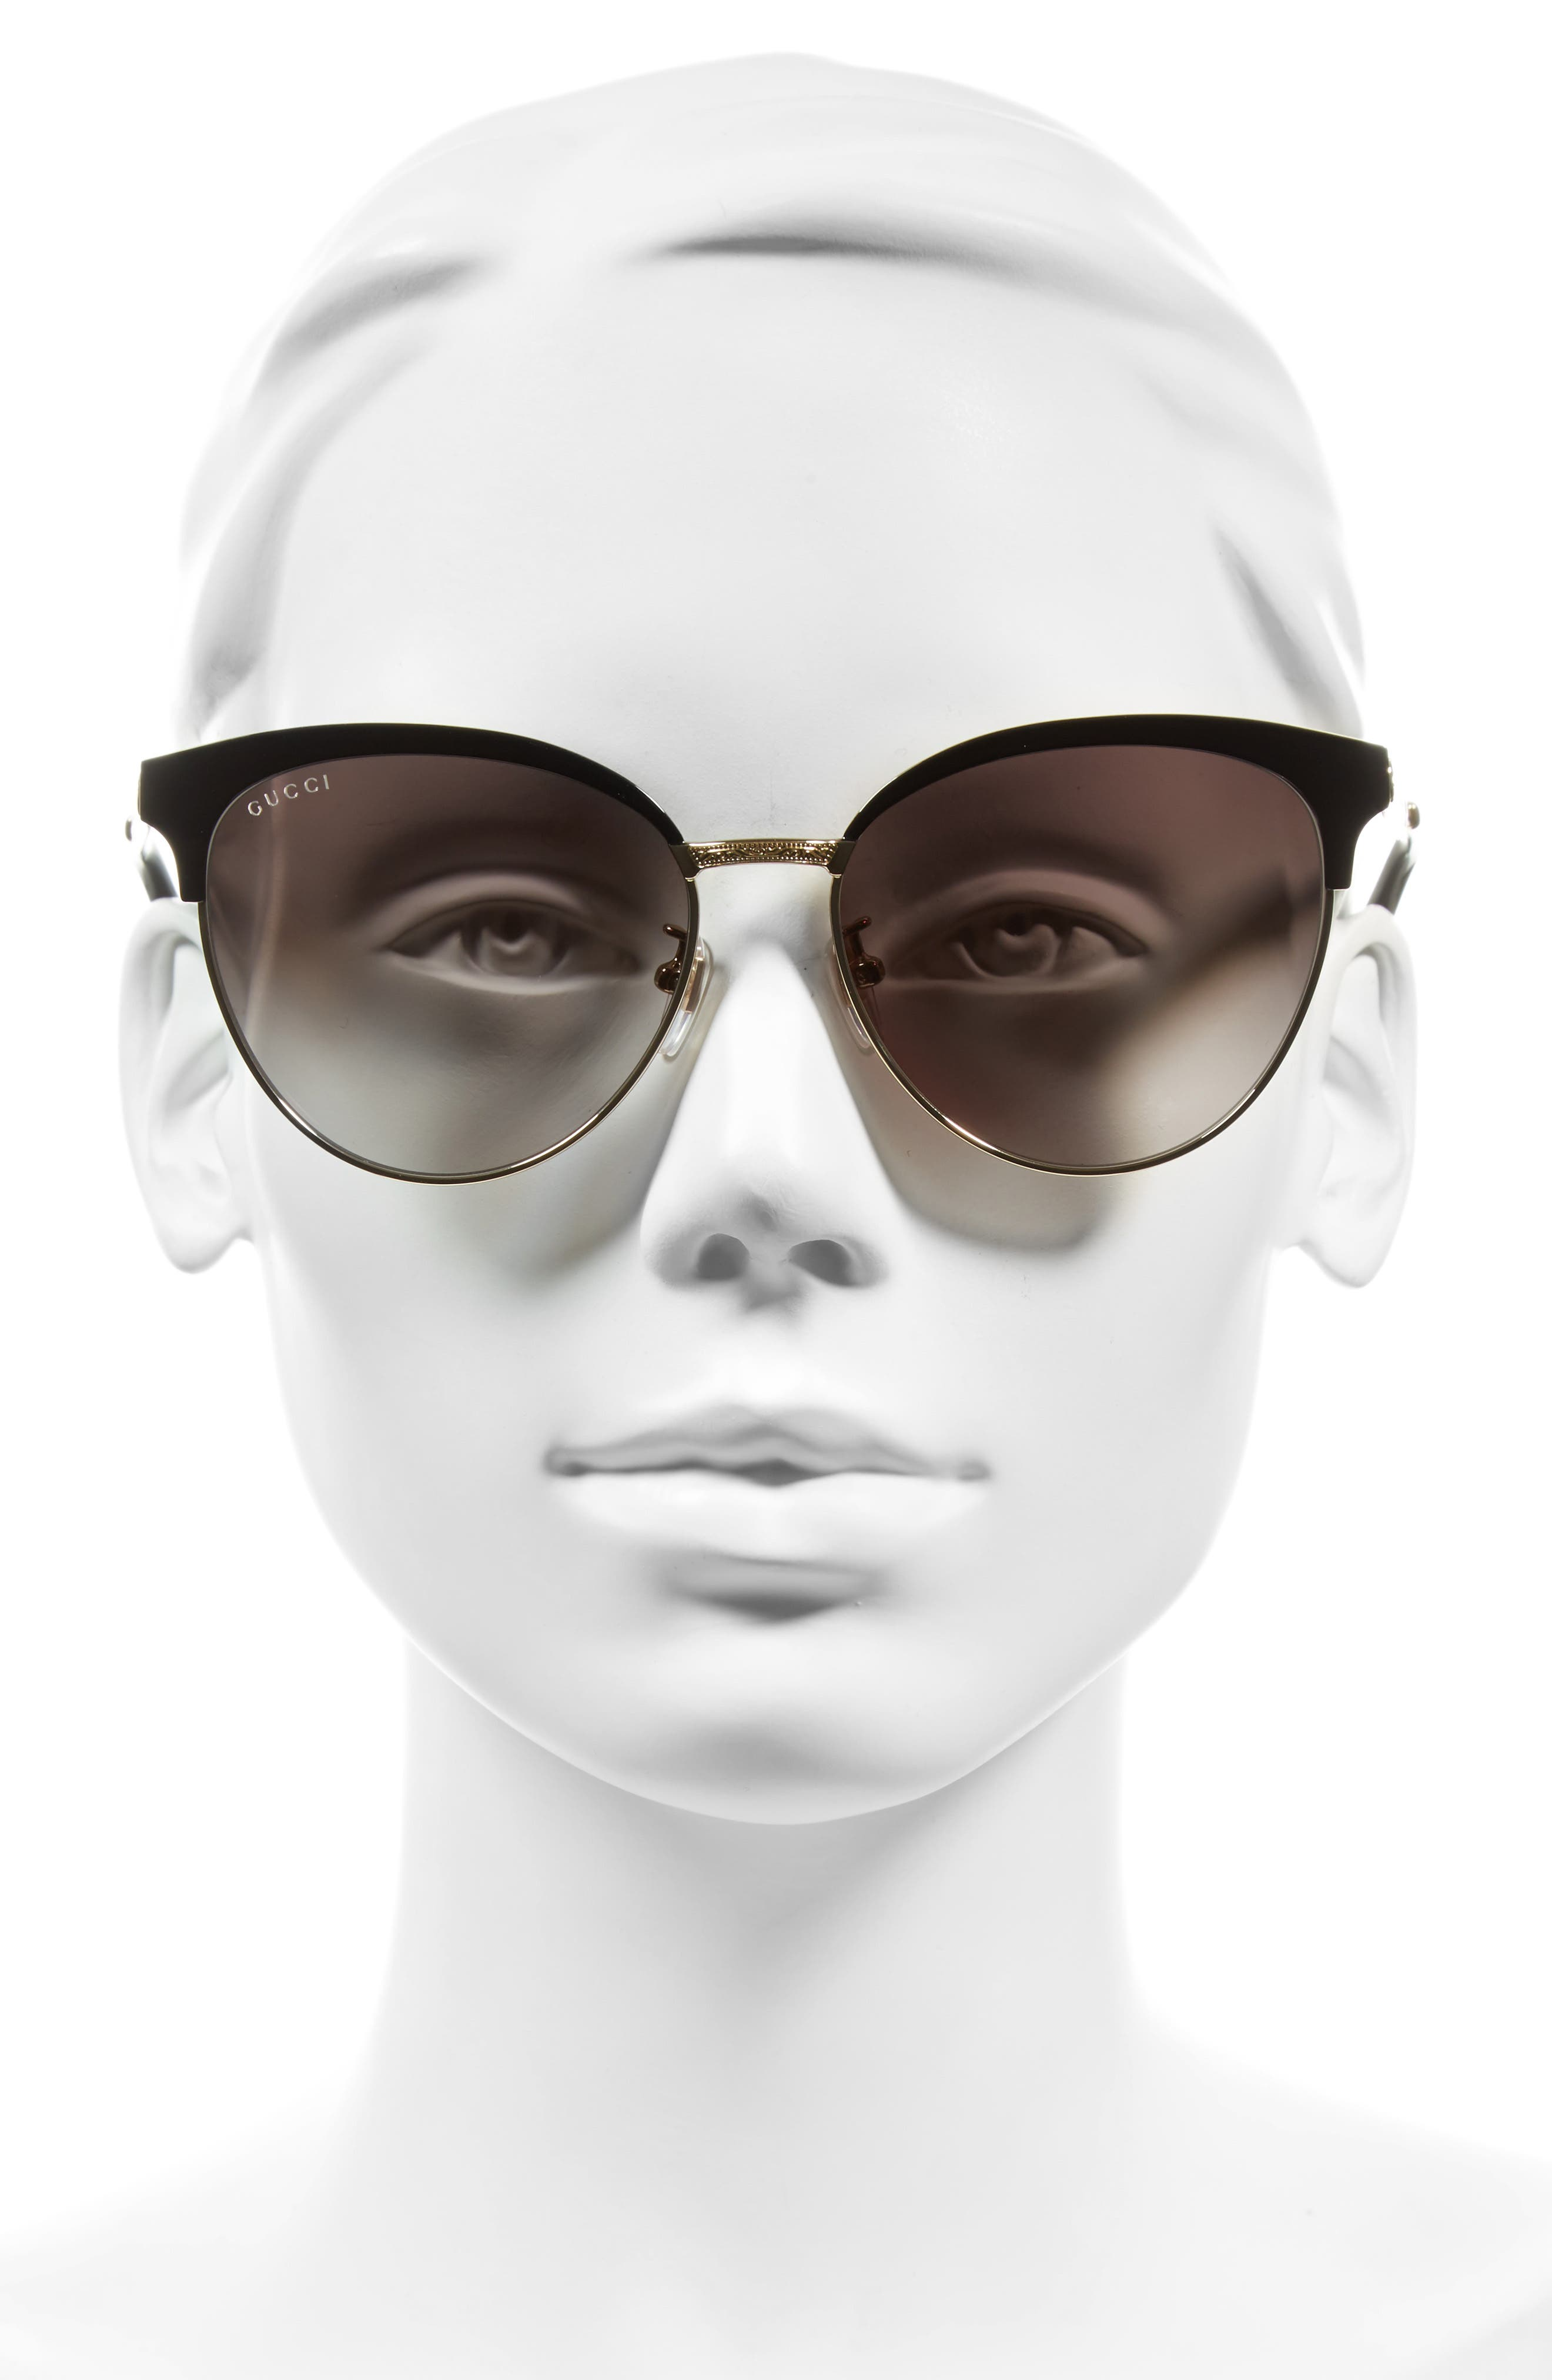 57mm Retro Sunglasses,                             Alternate thumbnail 2, color,                             001